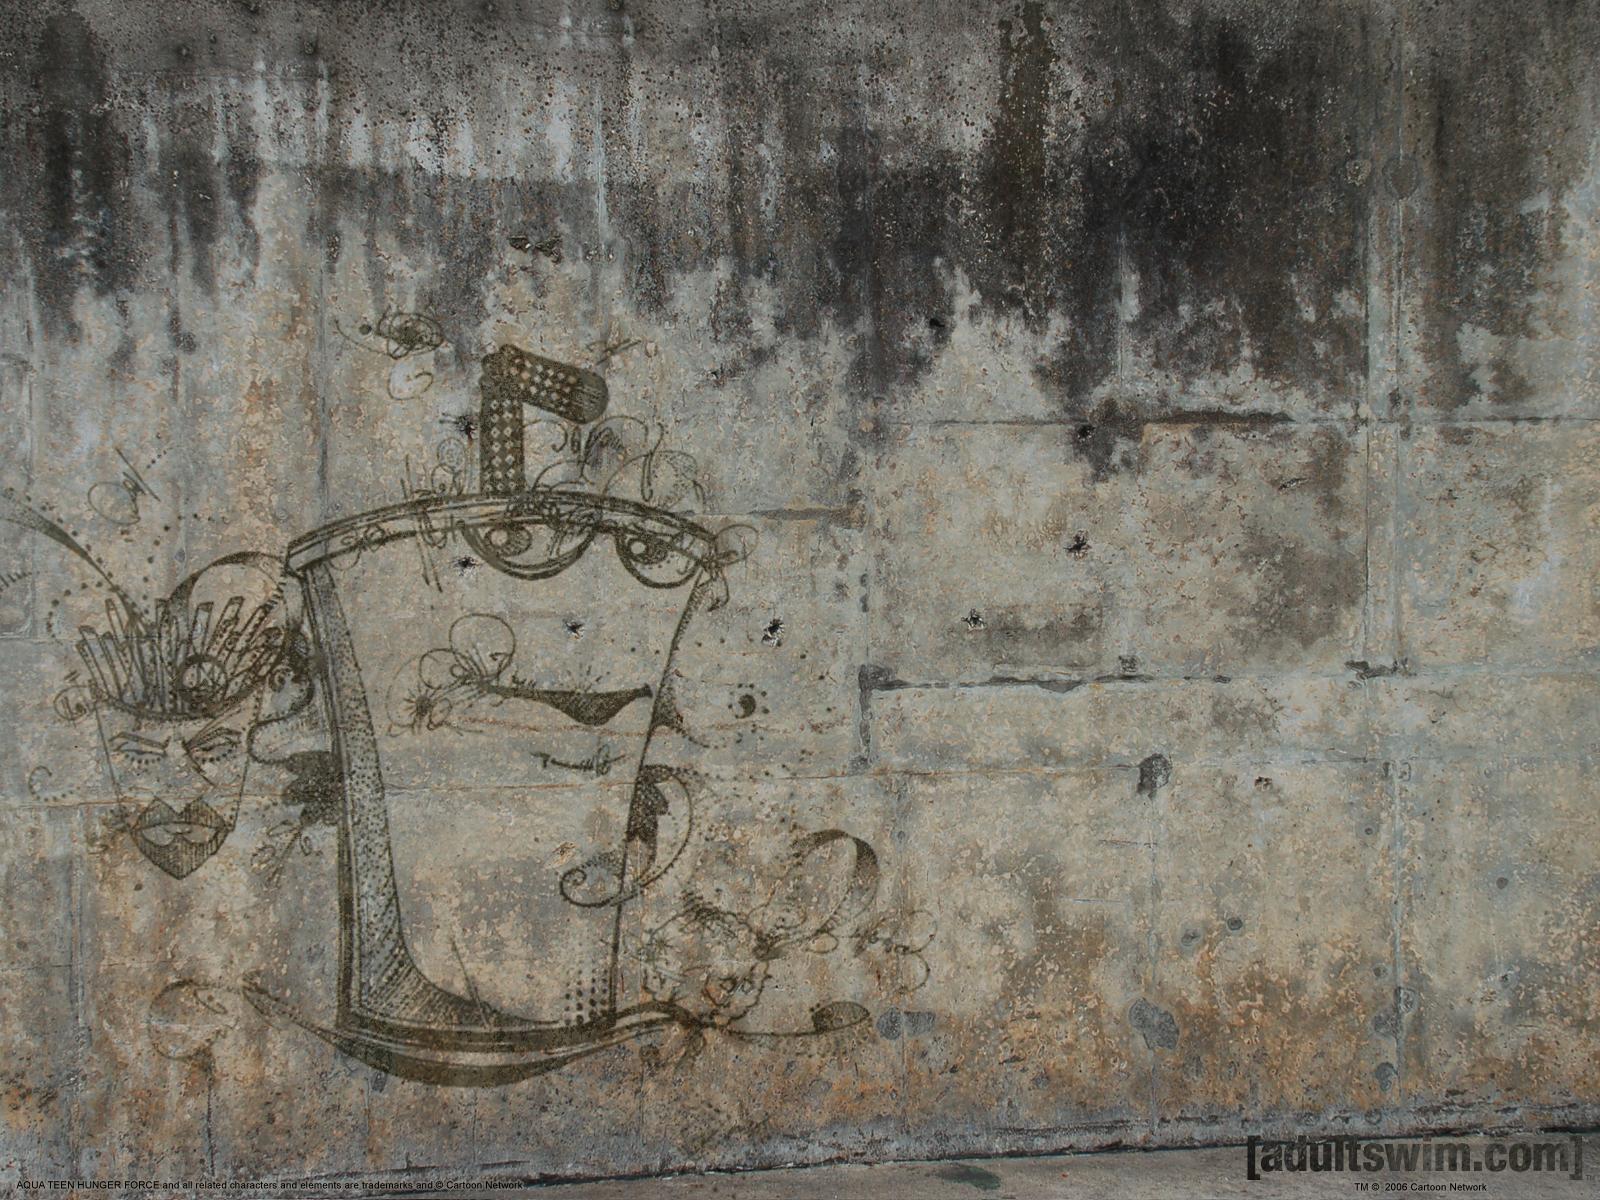 Cartoon - aqua teen hunger force Wallpaper